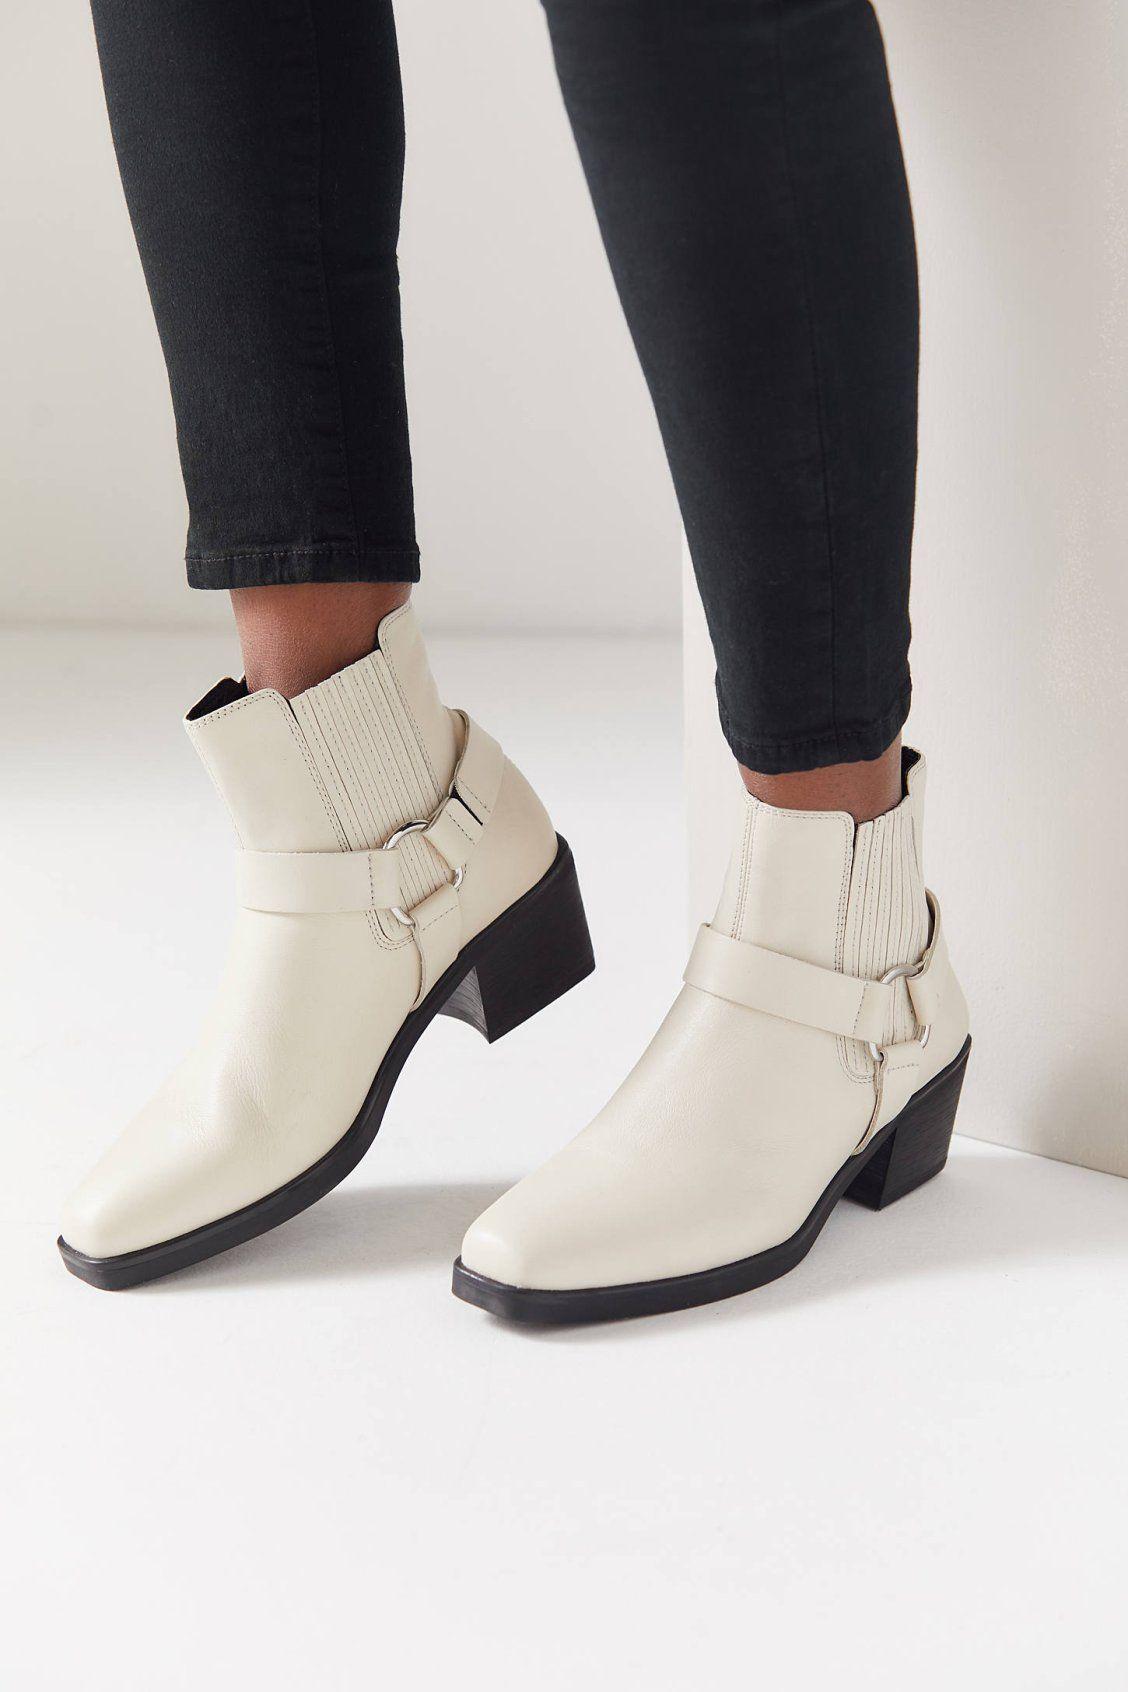 10861f4b546 Vagabond Shoemakers Simone Moto Boot   SHOES!!   Moto boots, Boots ...